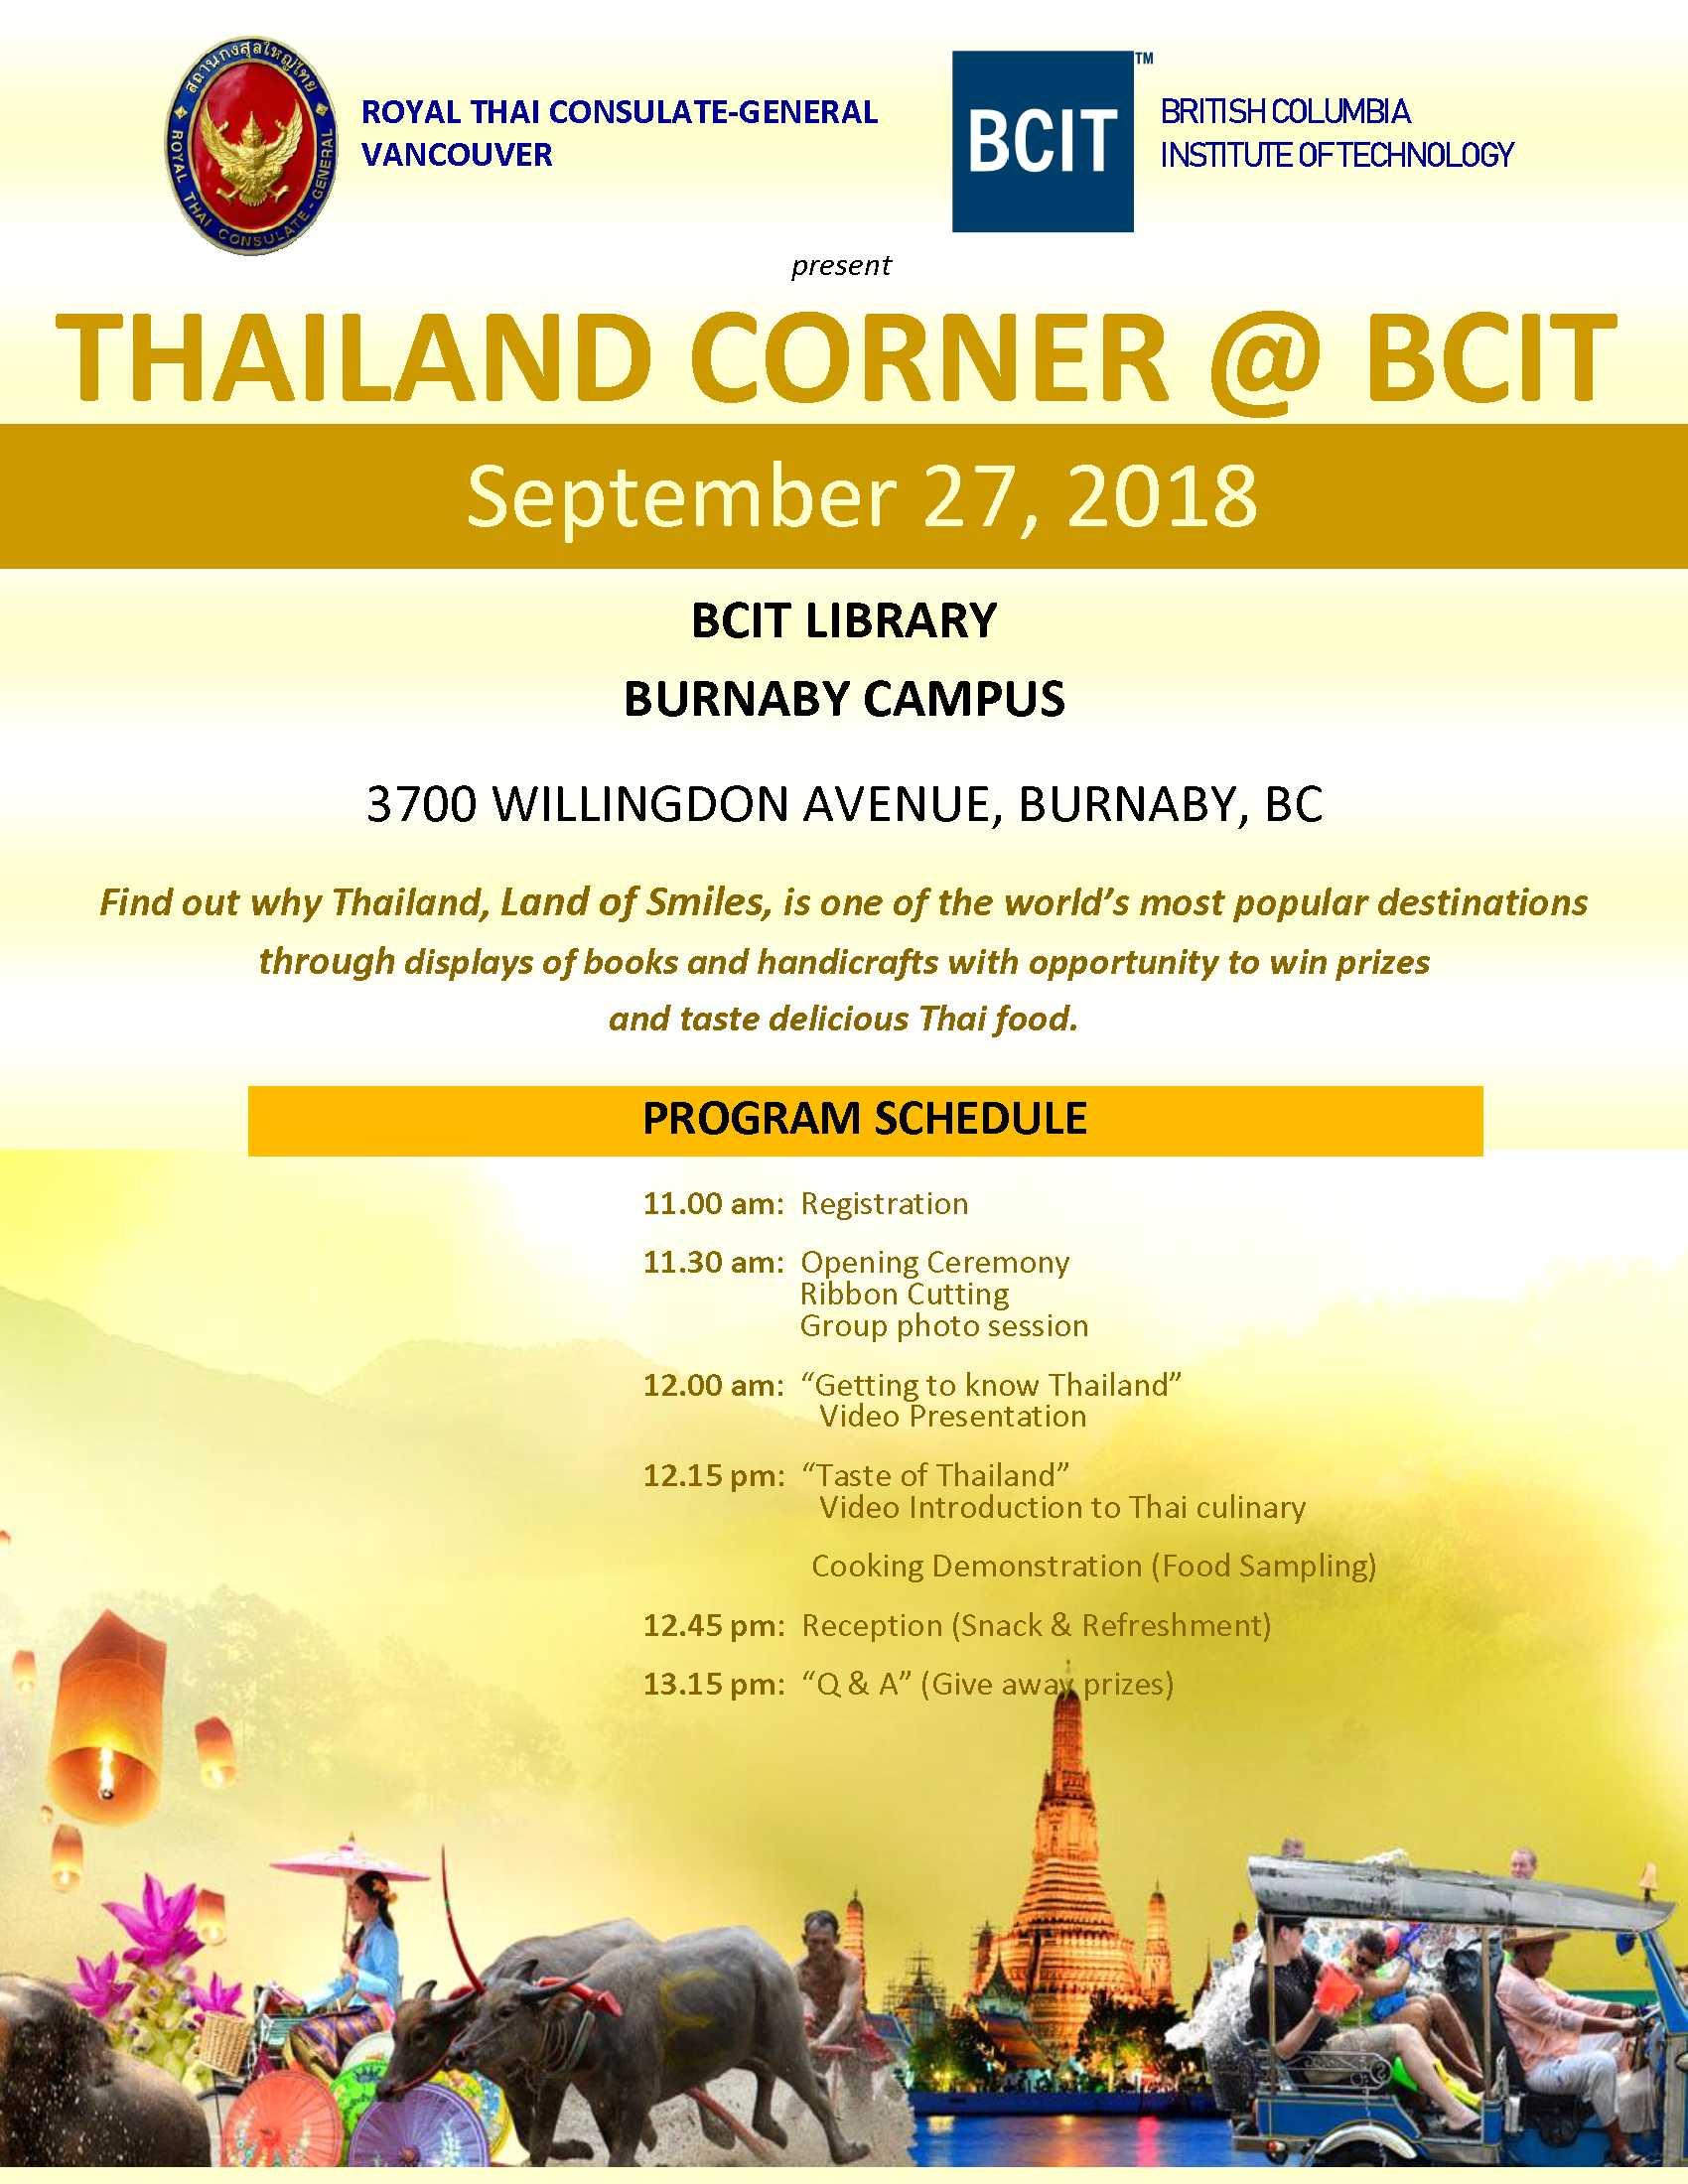 Thailand Corner at BCIT, September 27, 2018